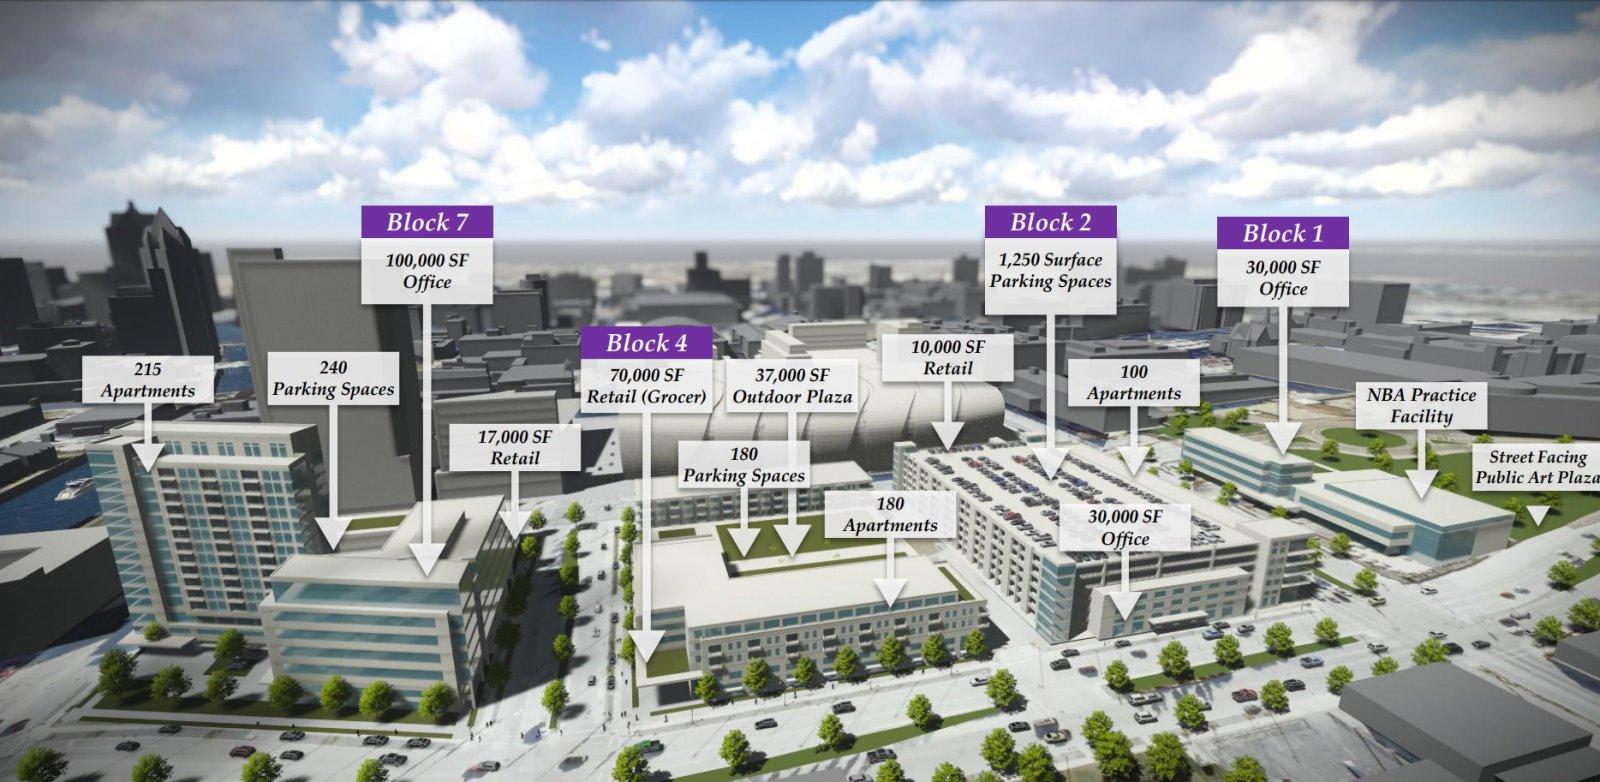 2015 Park East Development Plan